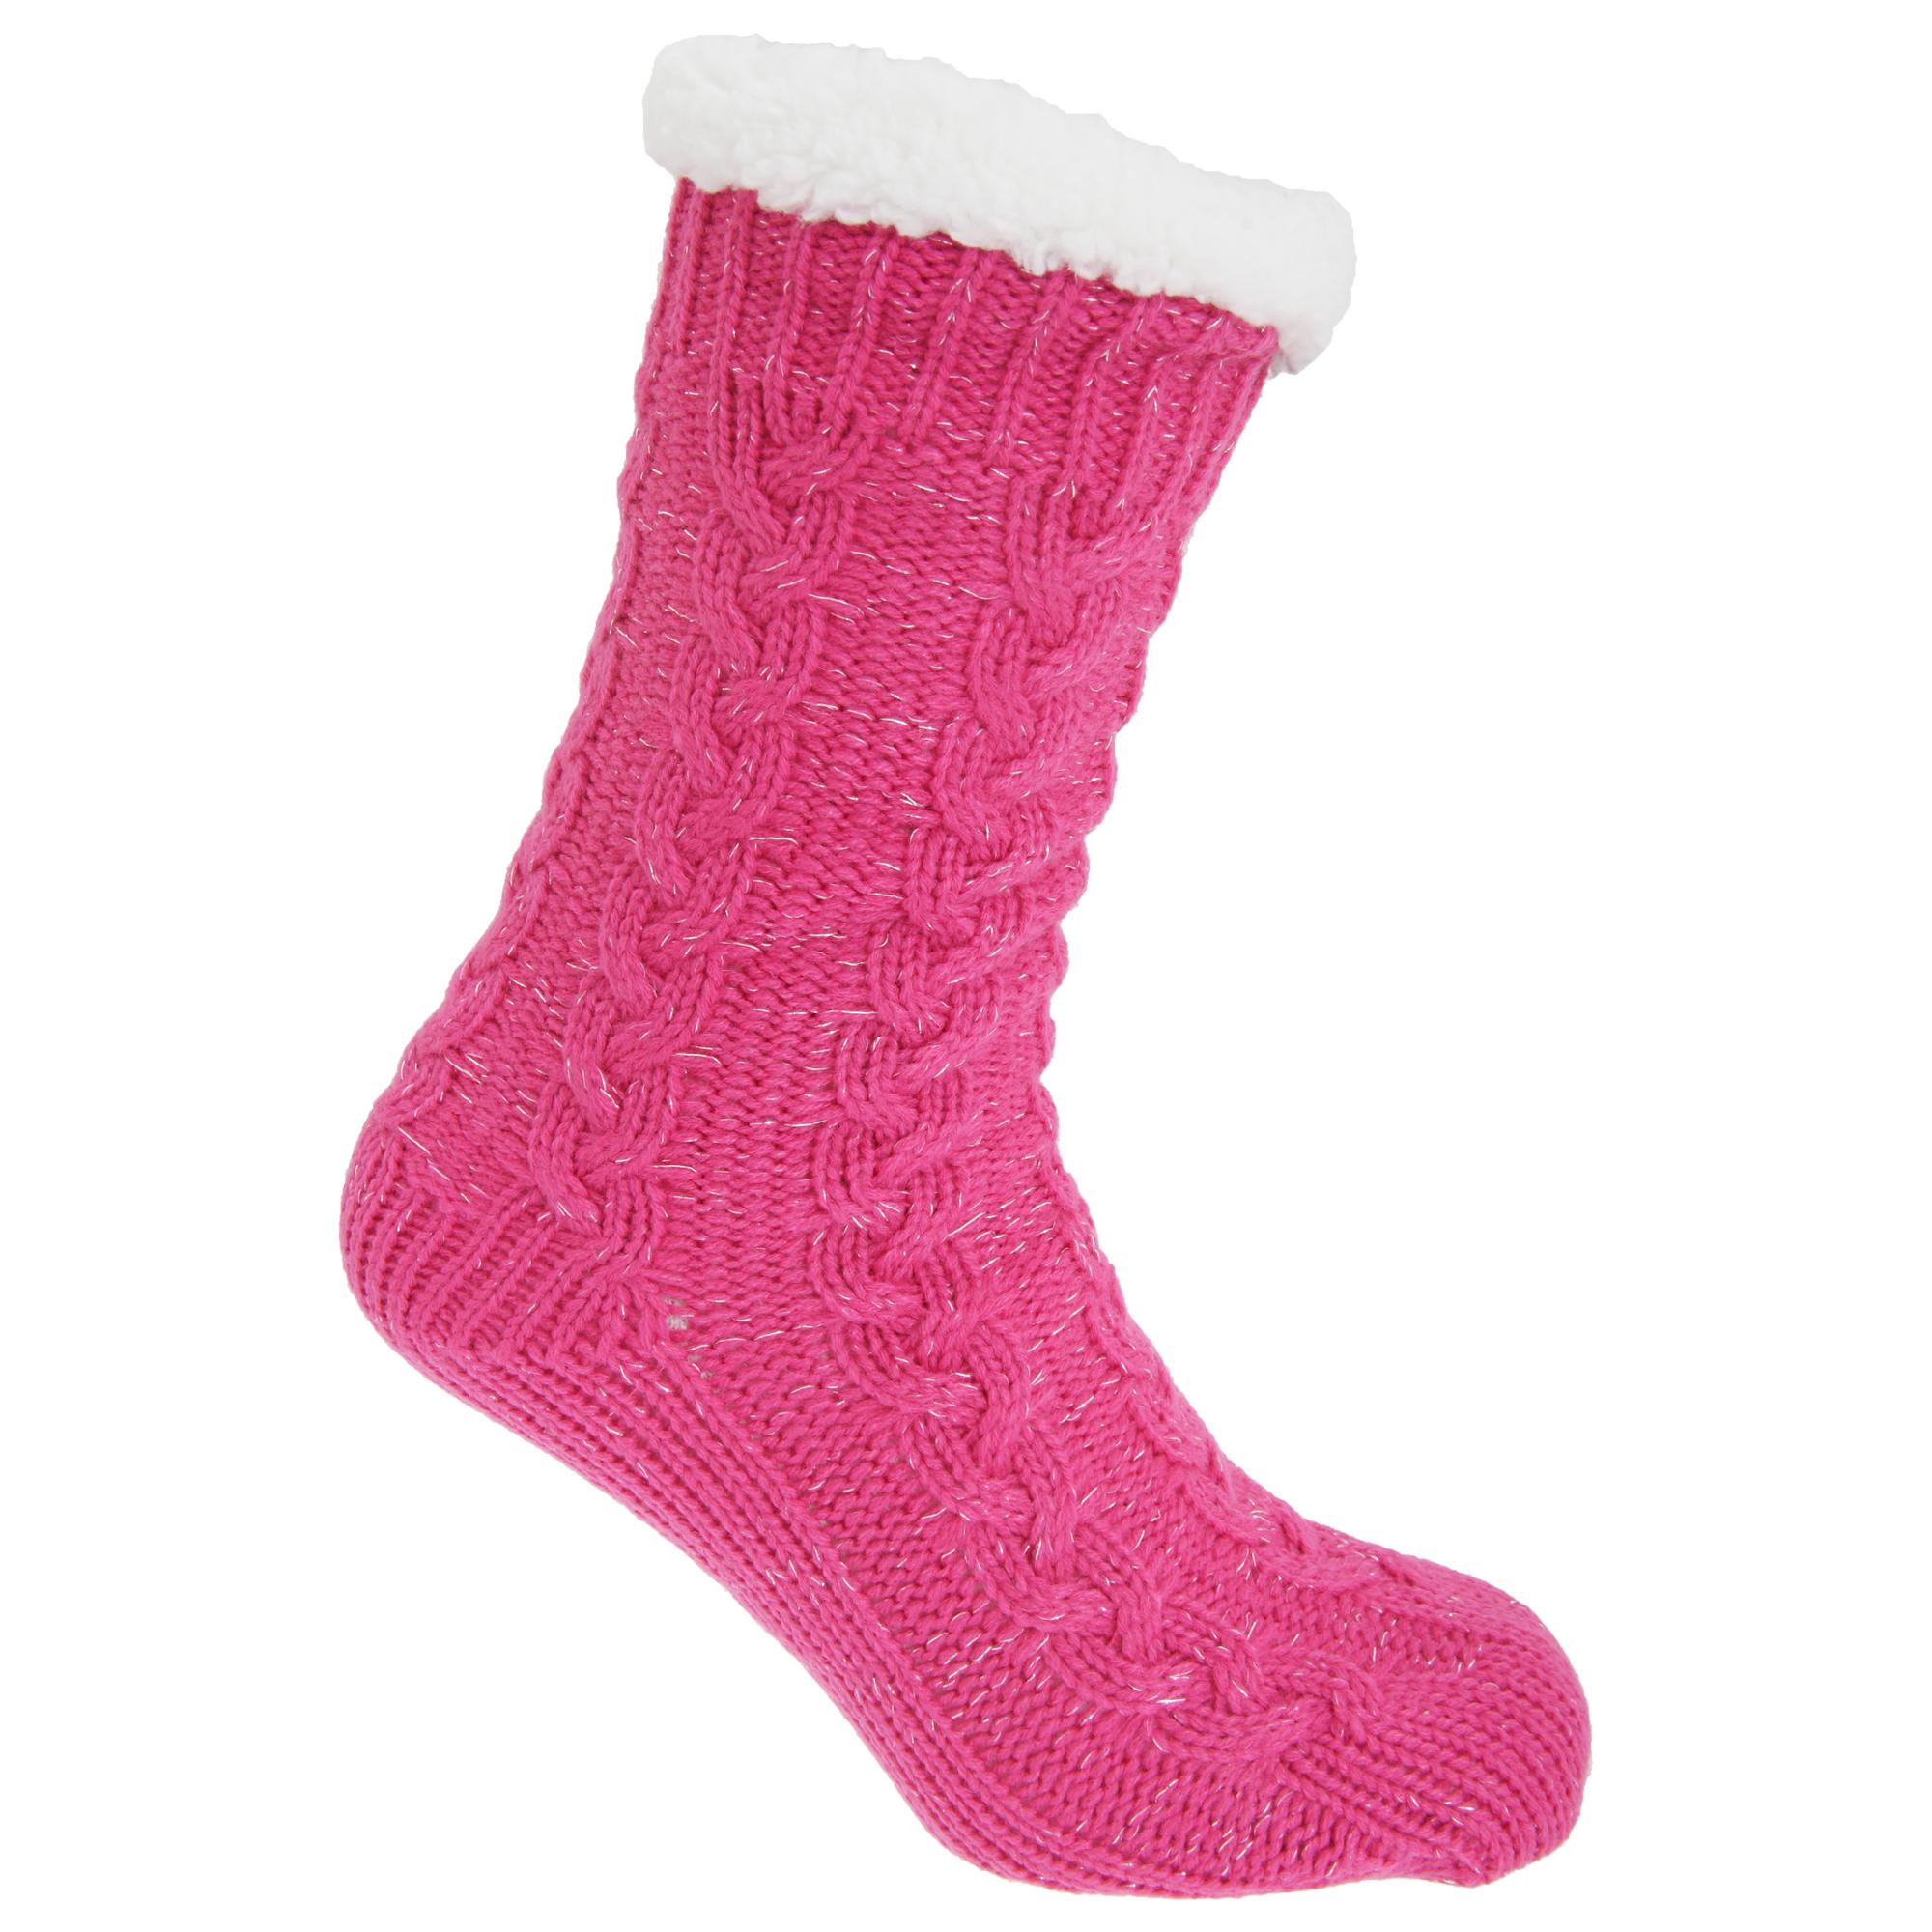 Co-zees Womens/Ladies Chunky Knit Glitter Lounge Slipper ...